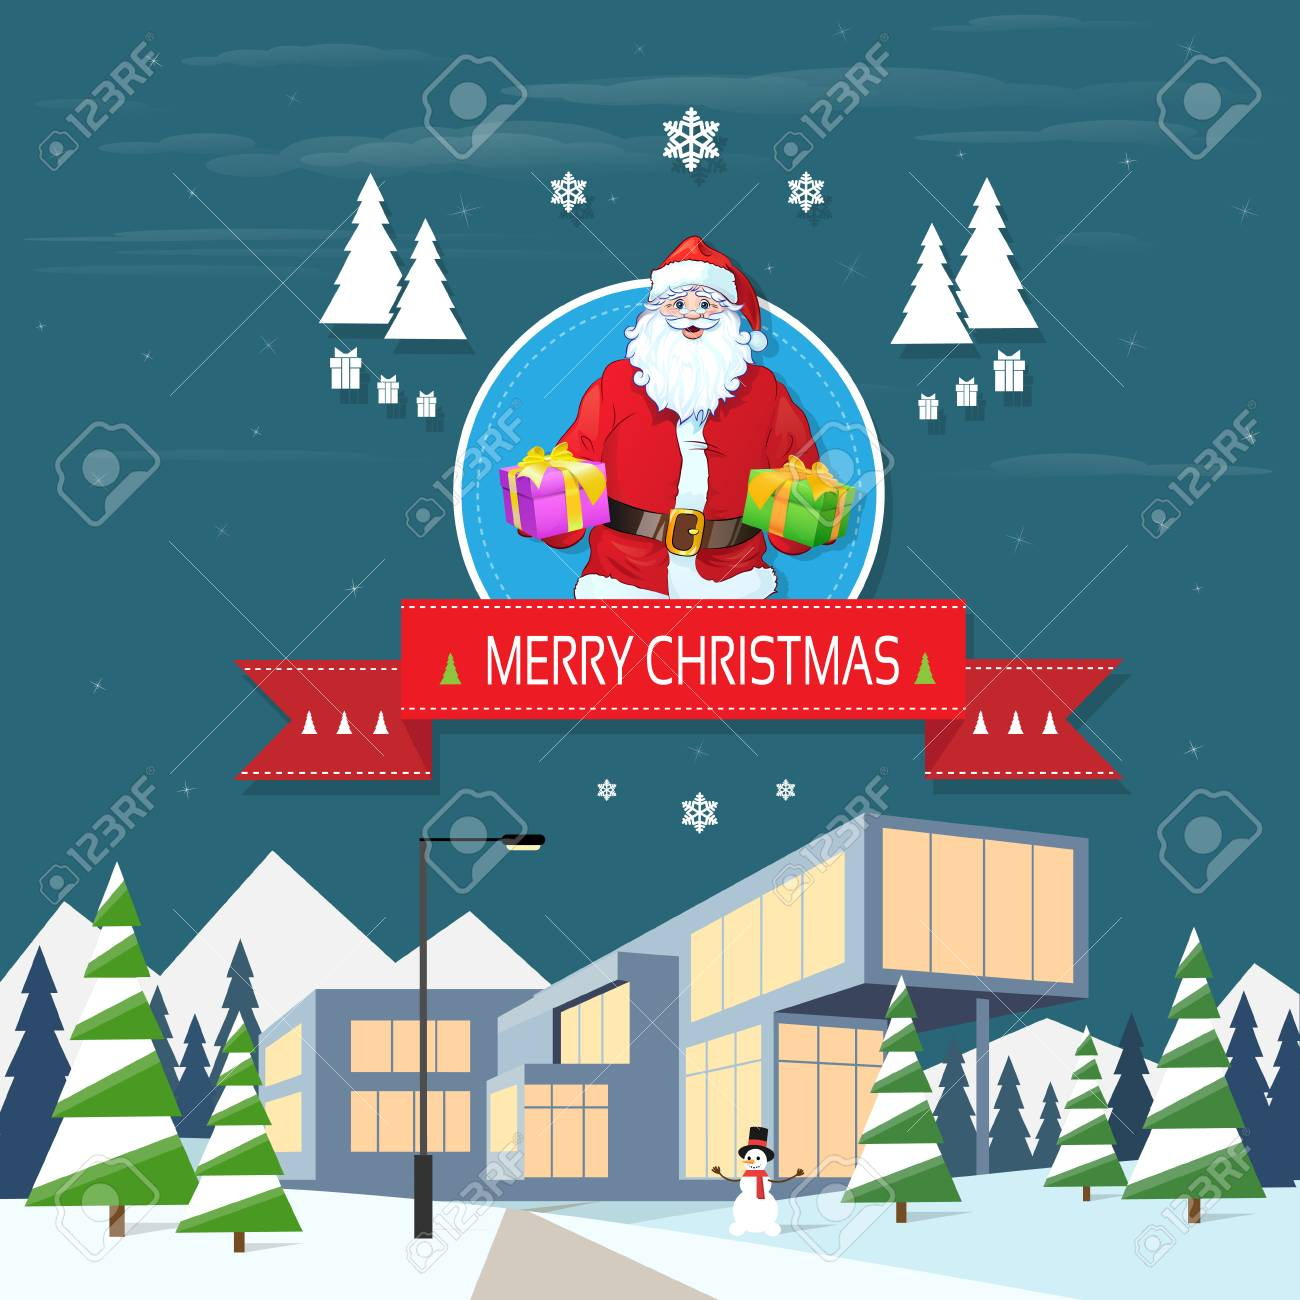 Santa claus on christmas greeting card holding gift box royalty free santa claus on christmas greeting card holding gift box stock vector 33948153 m4hsunfo